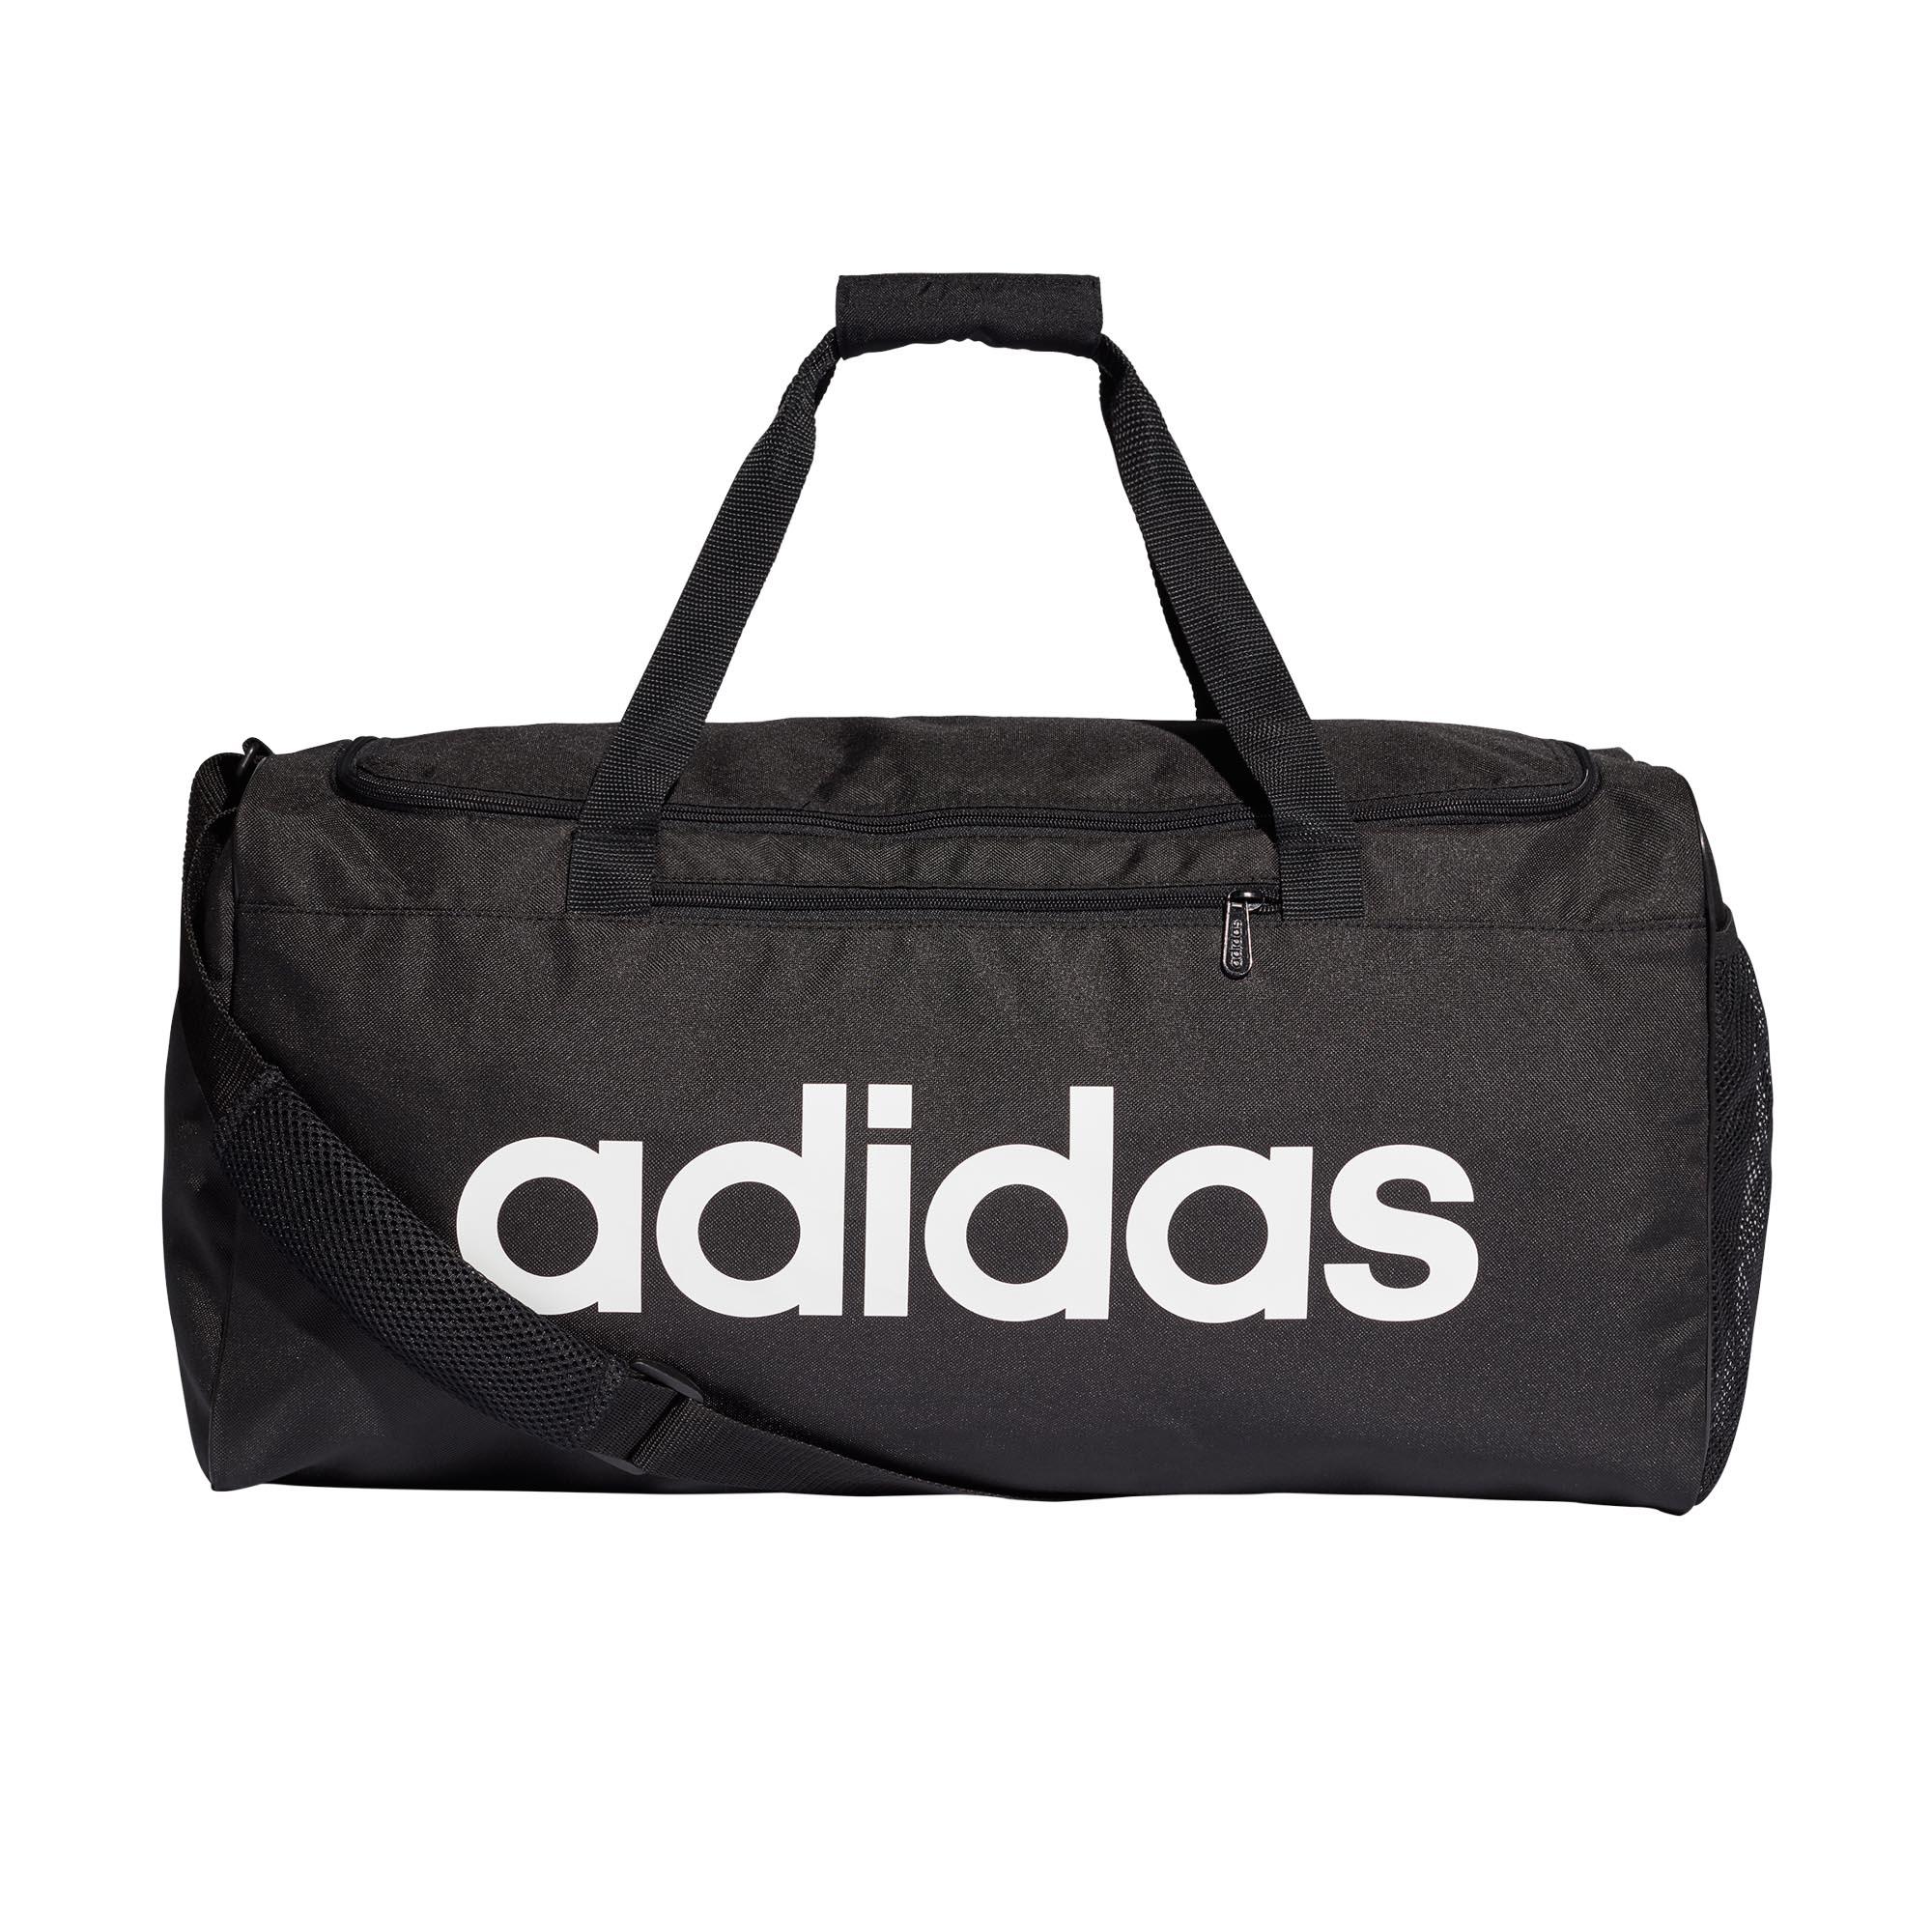 cd2cc498fced Details about adidas Linear Core Team Duffel Holdall Training Bag (Medium)  Black White